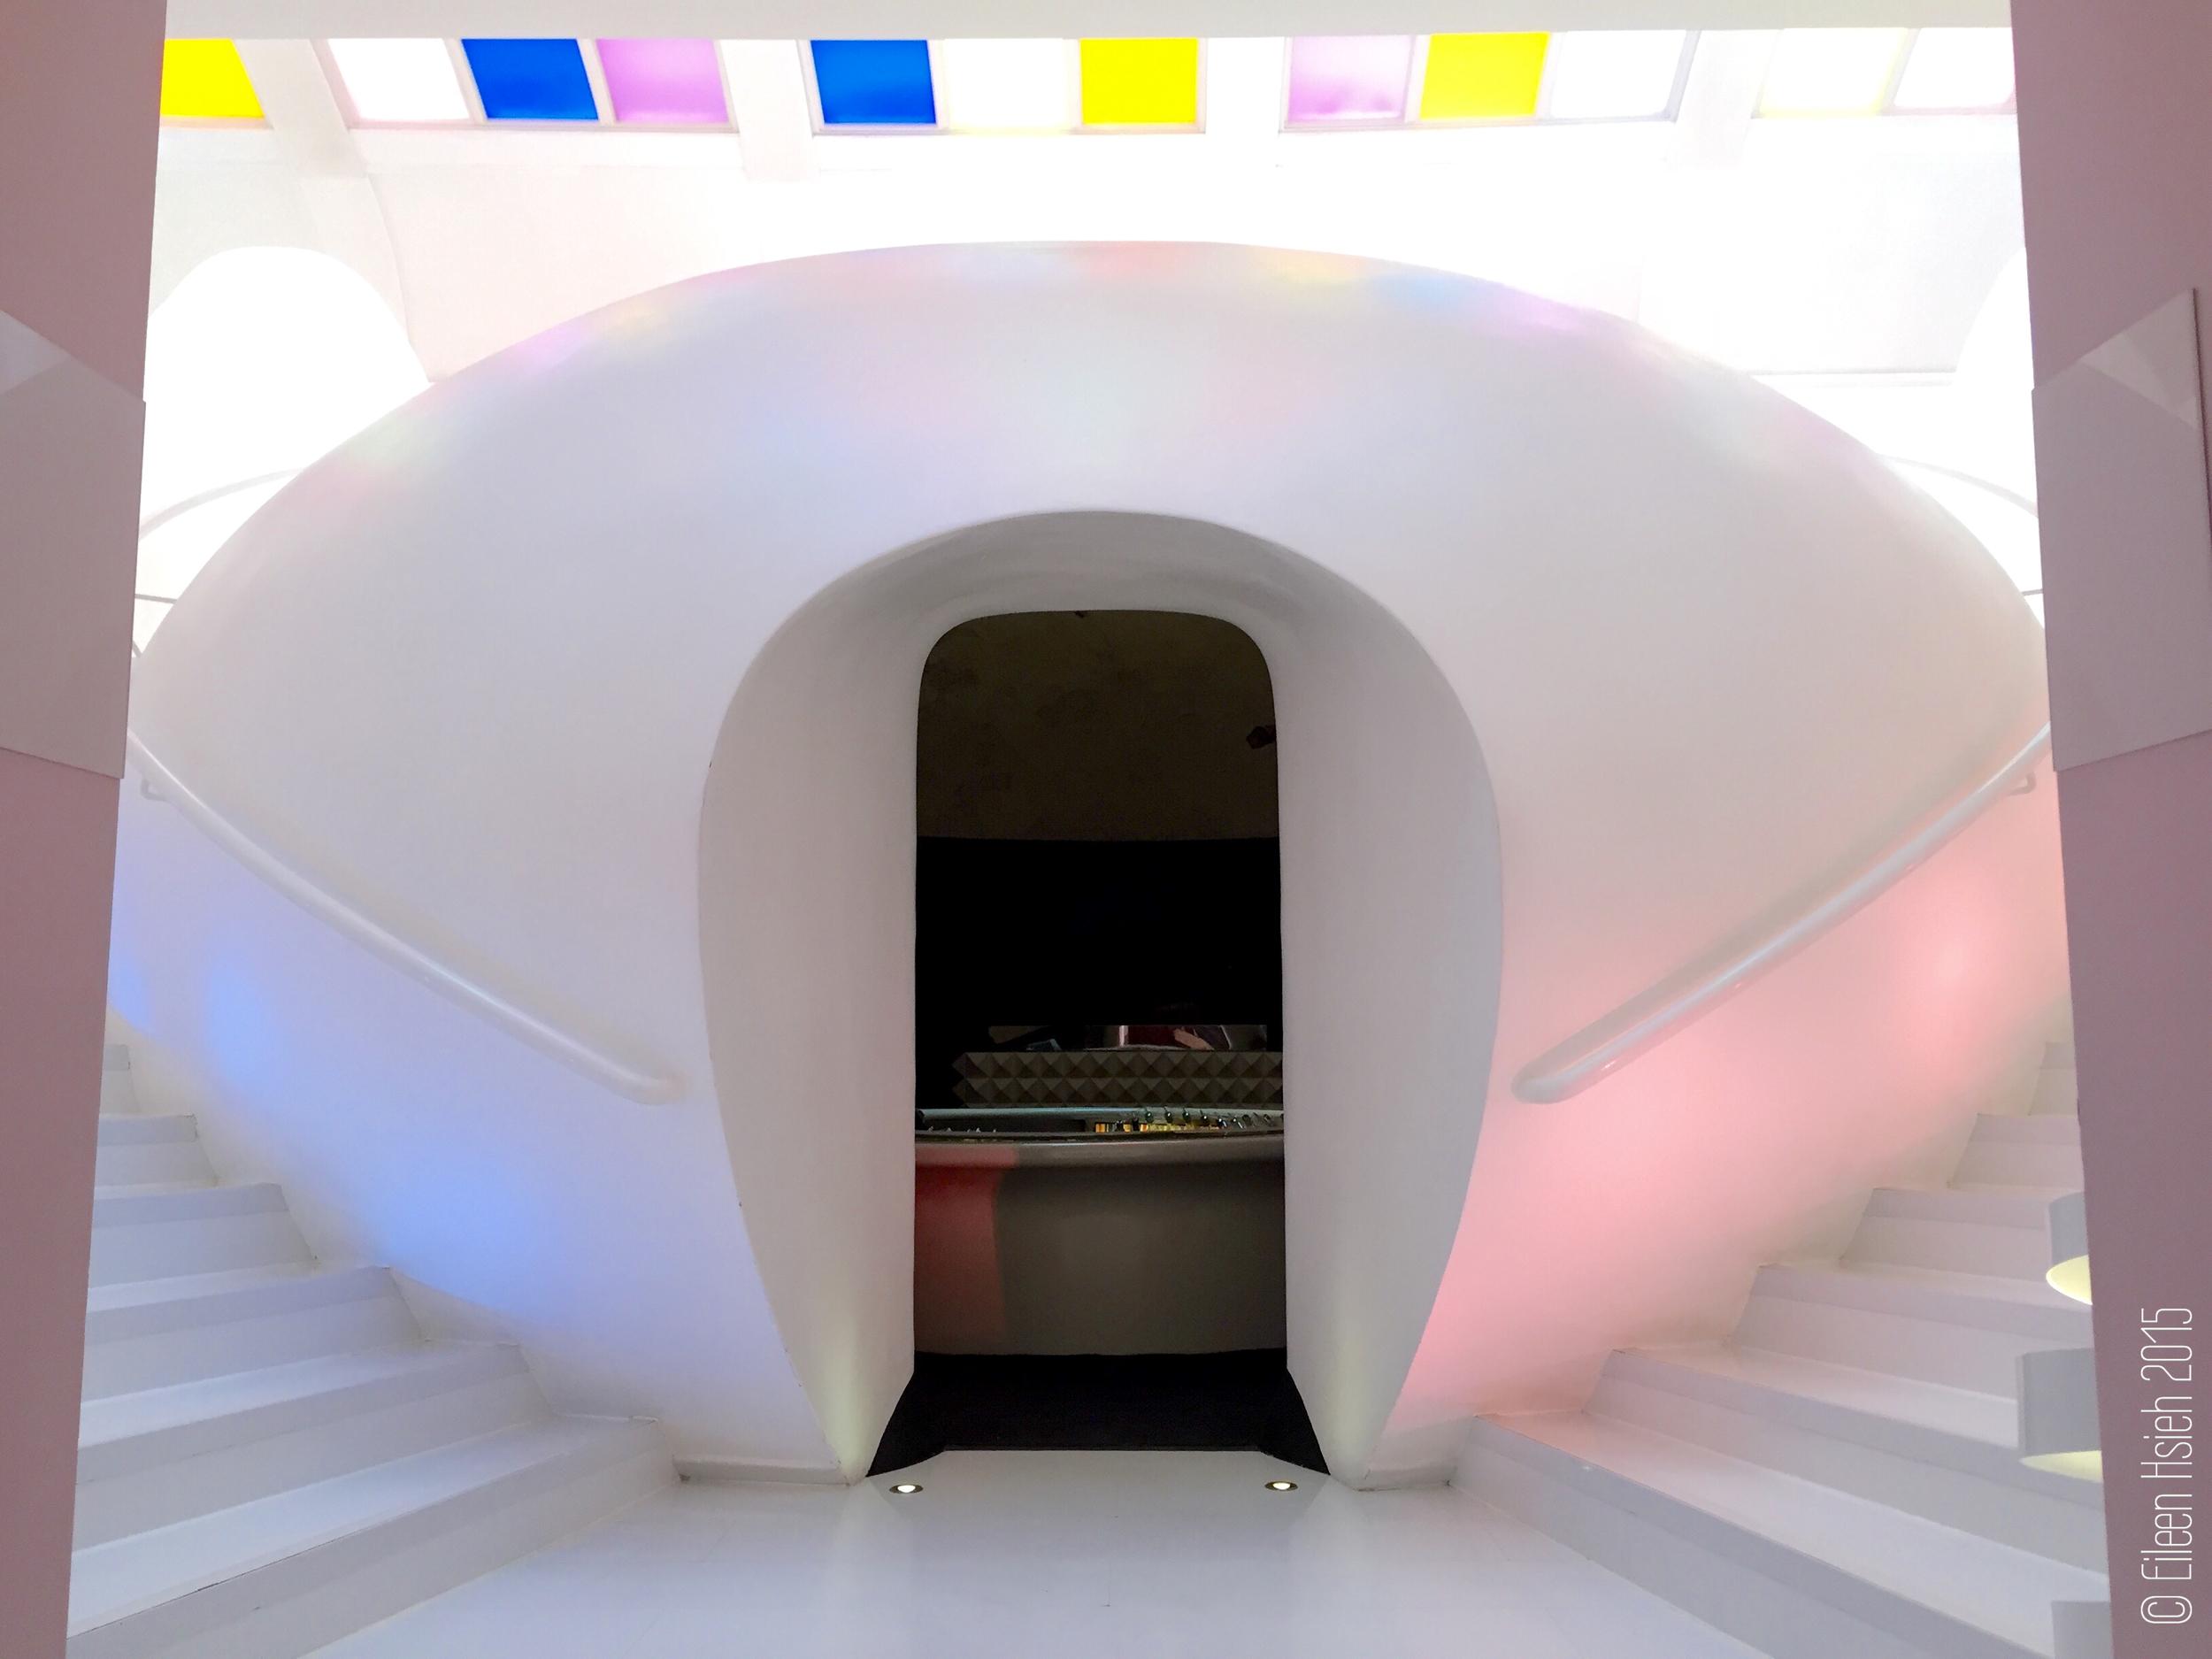 Futuristic design dominates Sketch London's East Bar andbathroom. 未來風格的廁所就在 East Bar 酒吧的正上方。 © Eileen Hsieh 2015